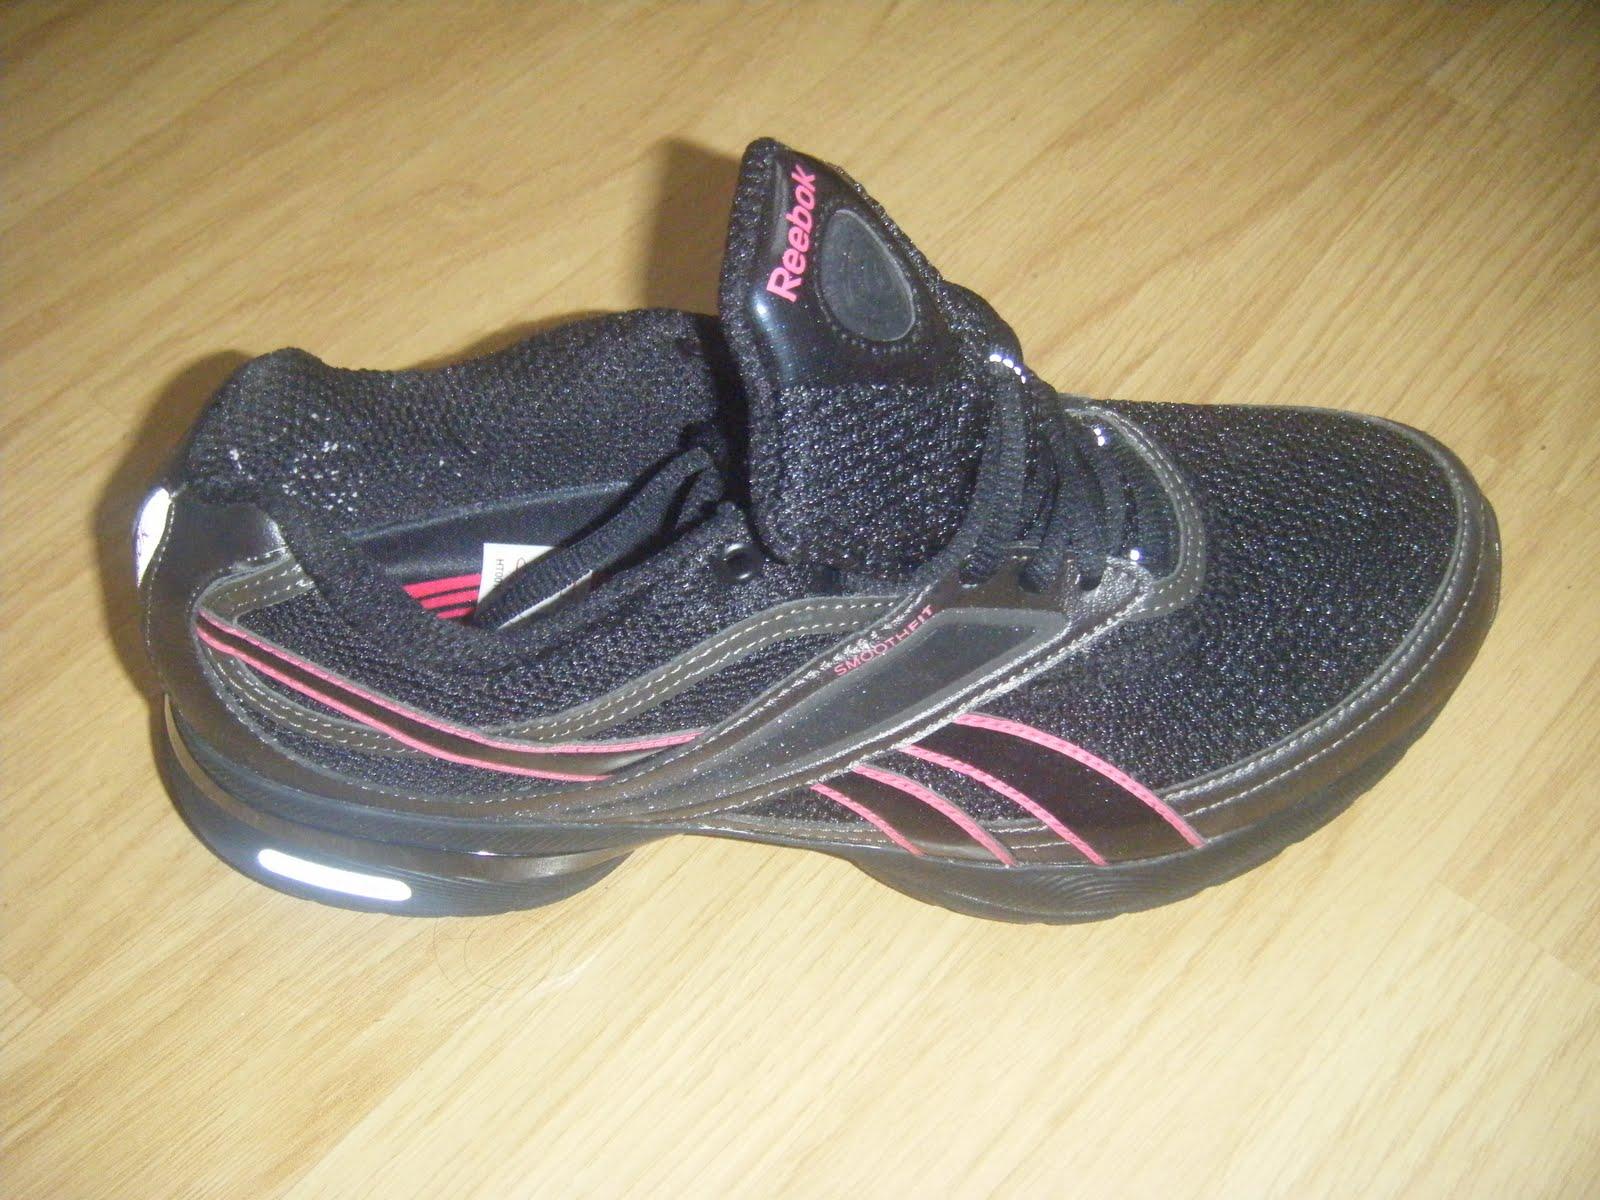 Chaussures De Sport Moche